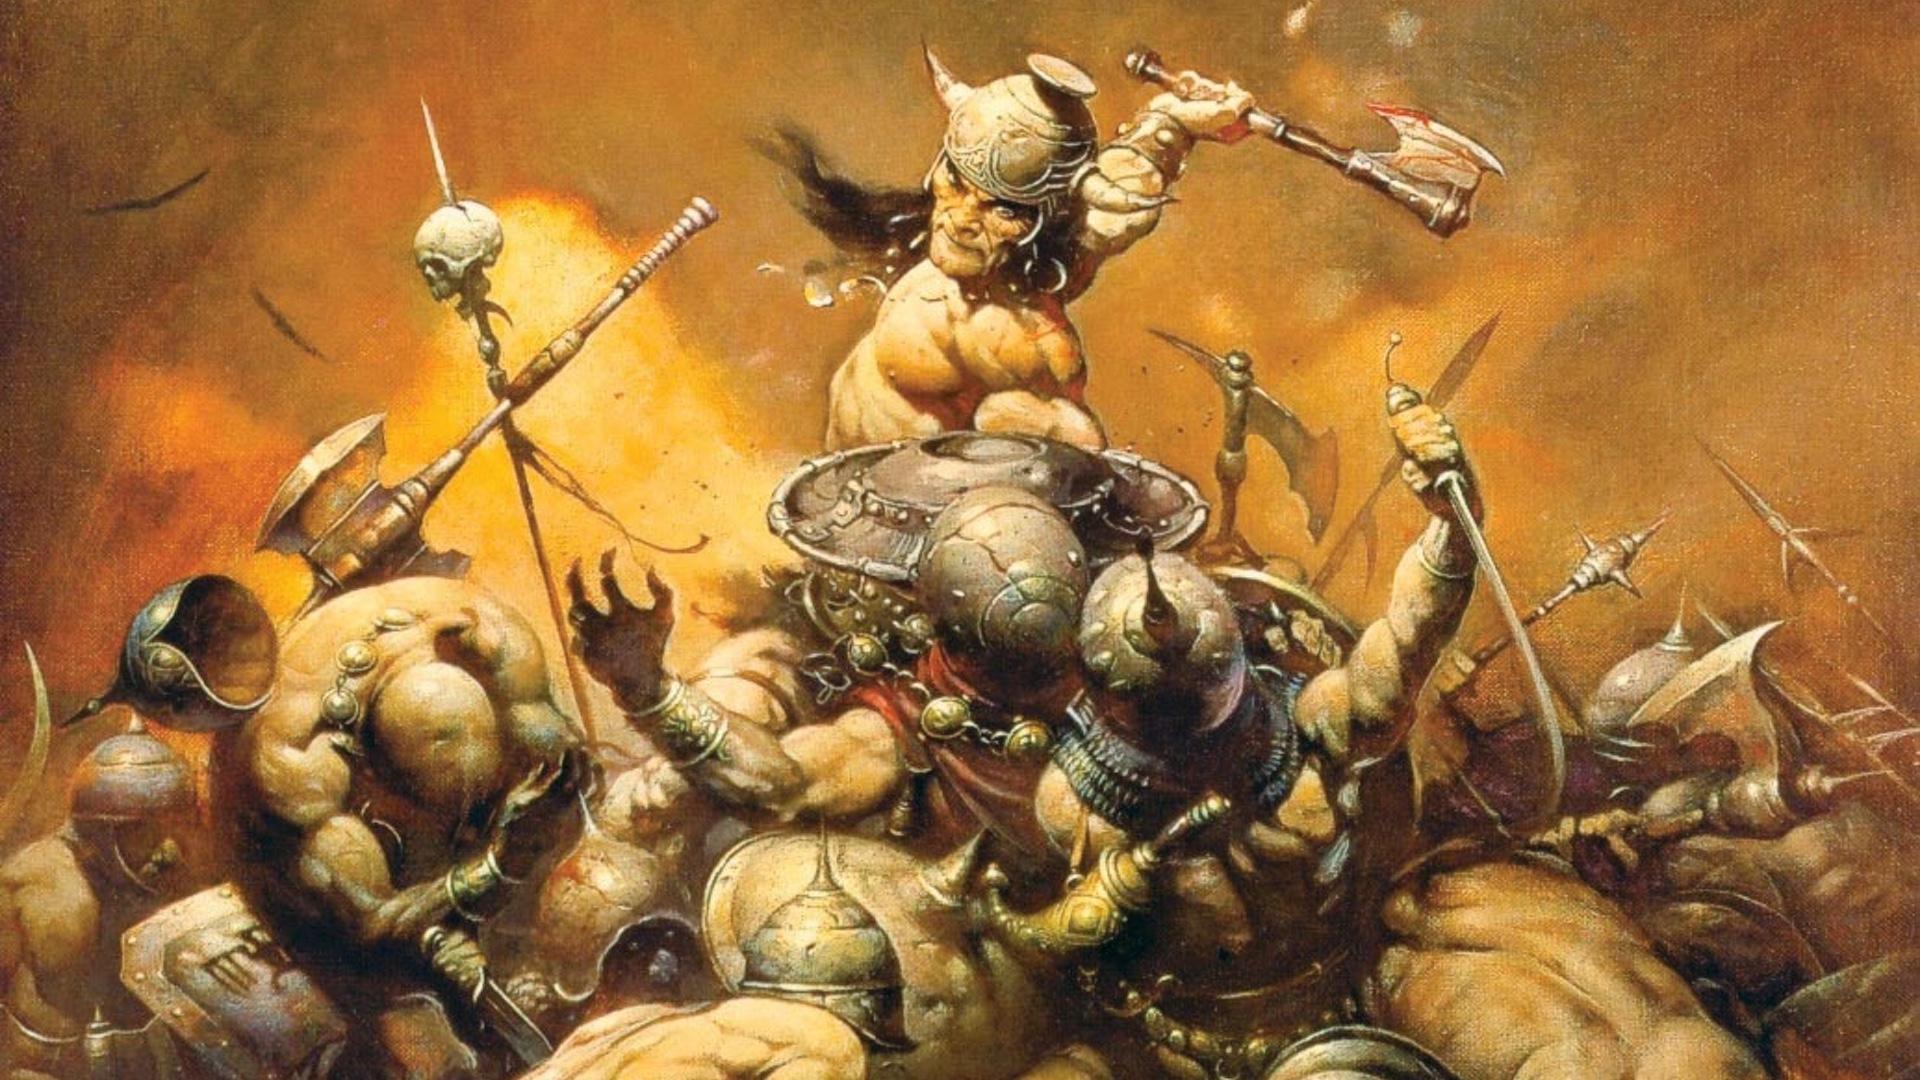 Conan and the Amazon